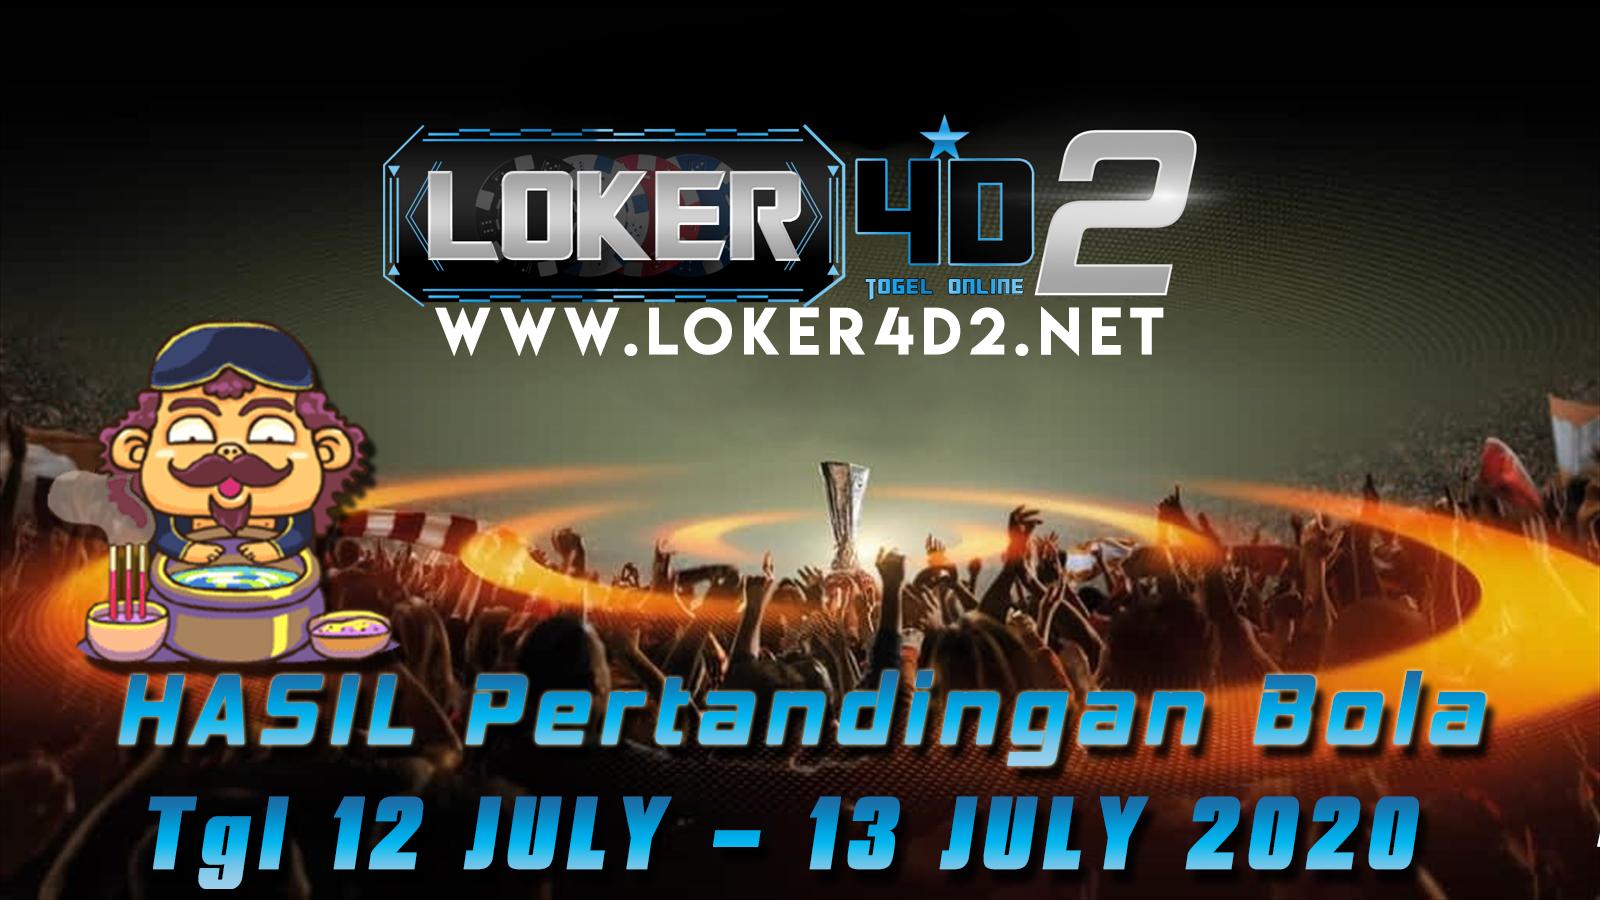 HASIL PERTANDINGAN BOLA 12-13 JULI 2020